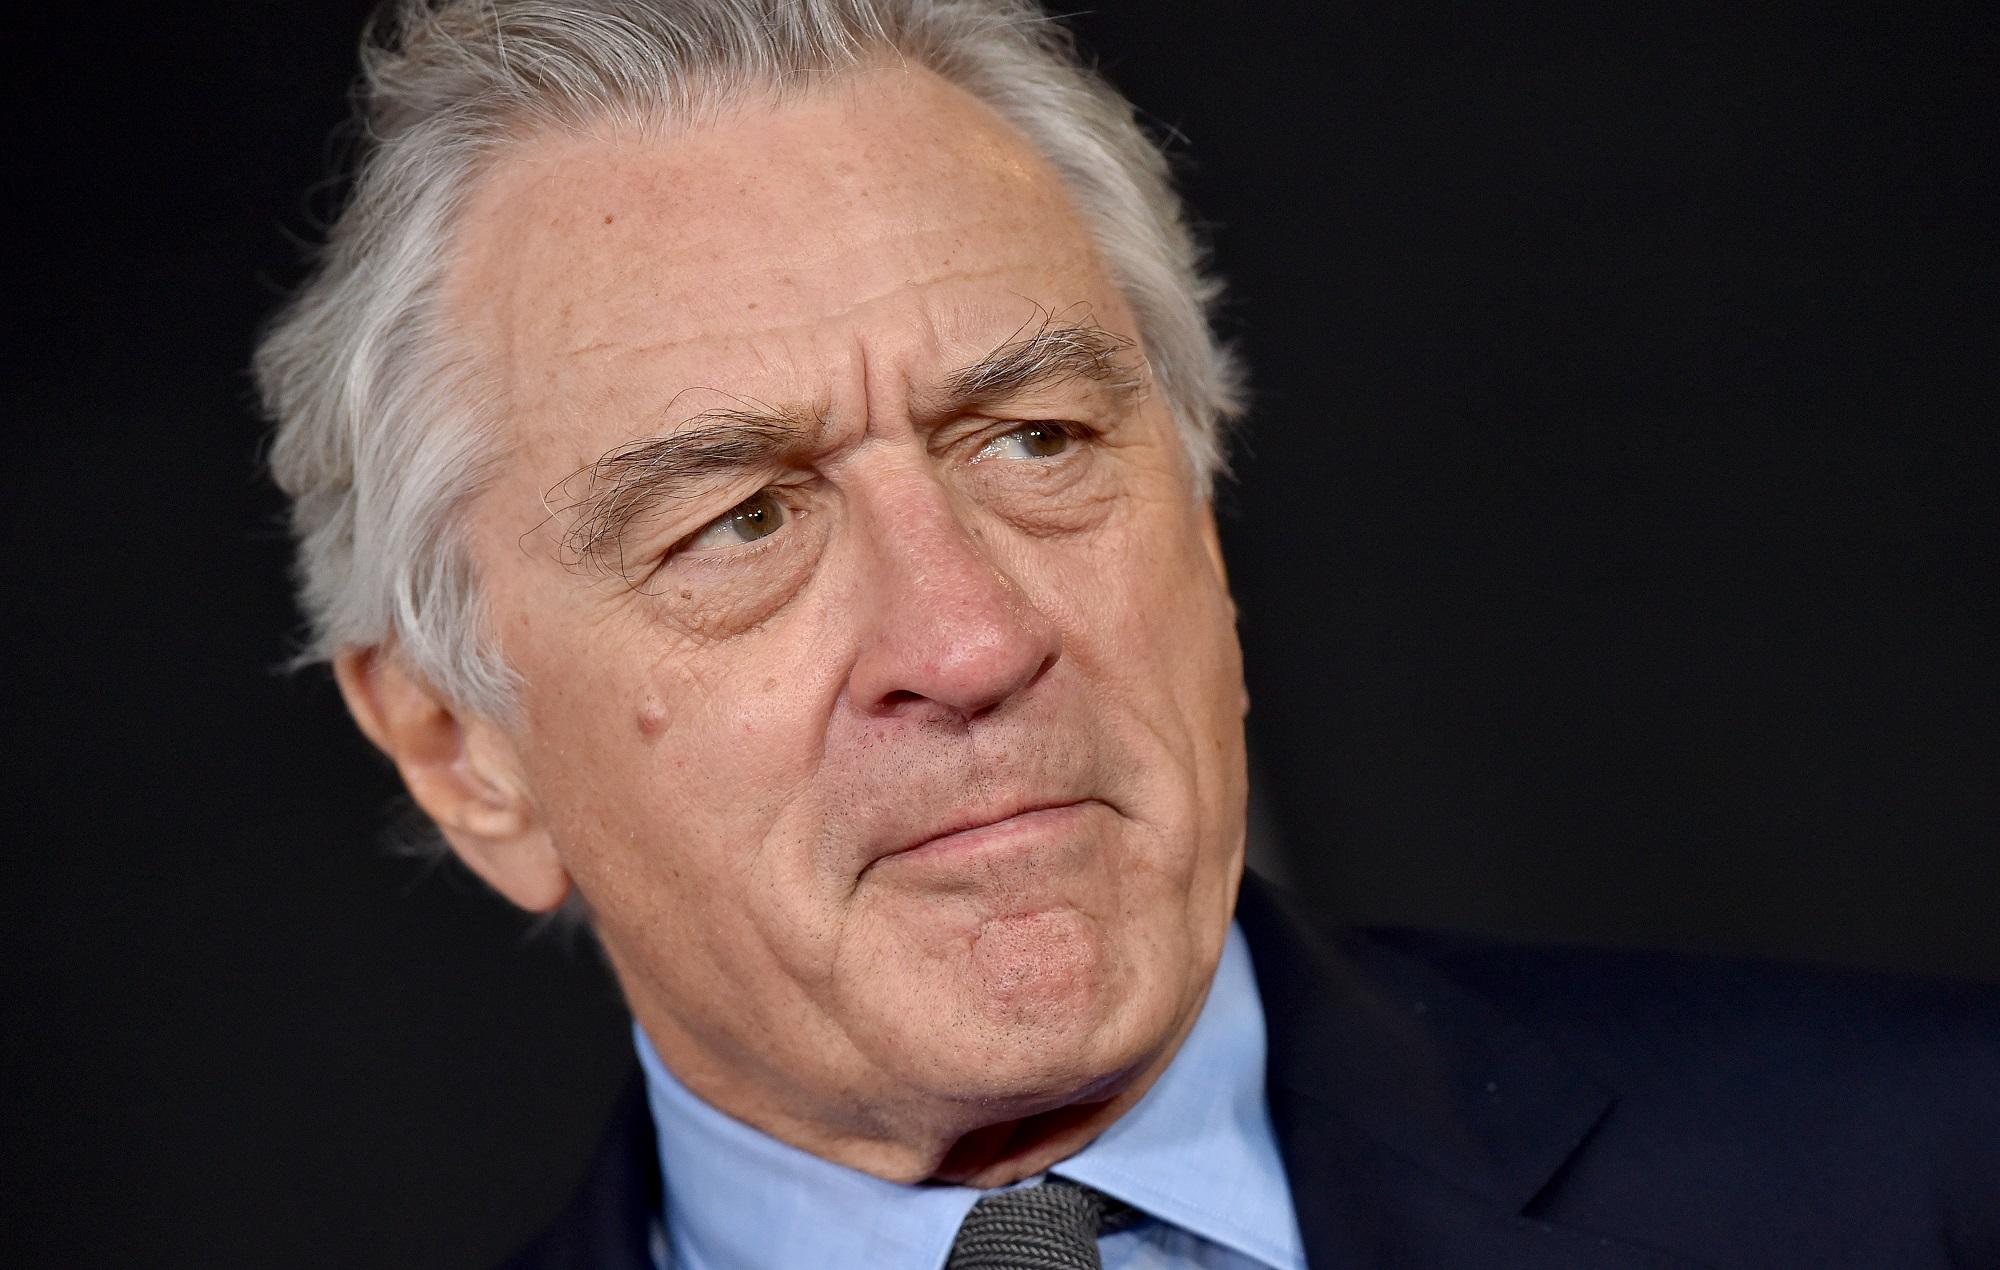 Coronavirus has left Robert De Niro with money troubles, lawyer confirms